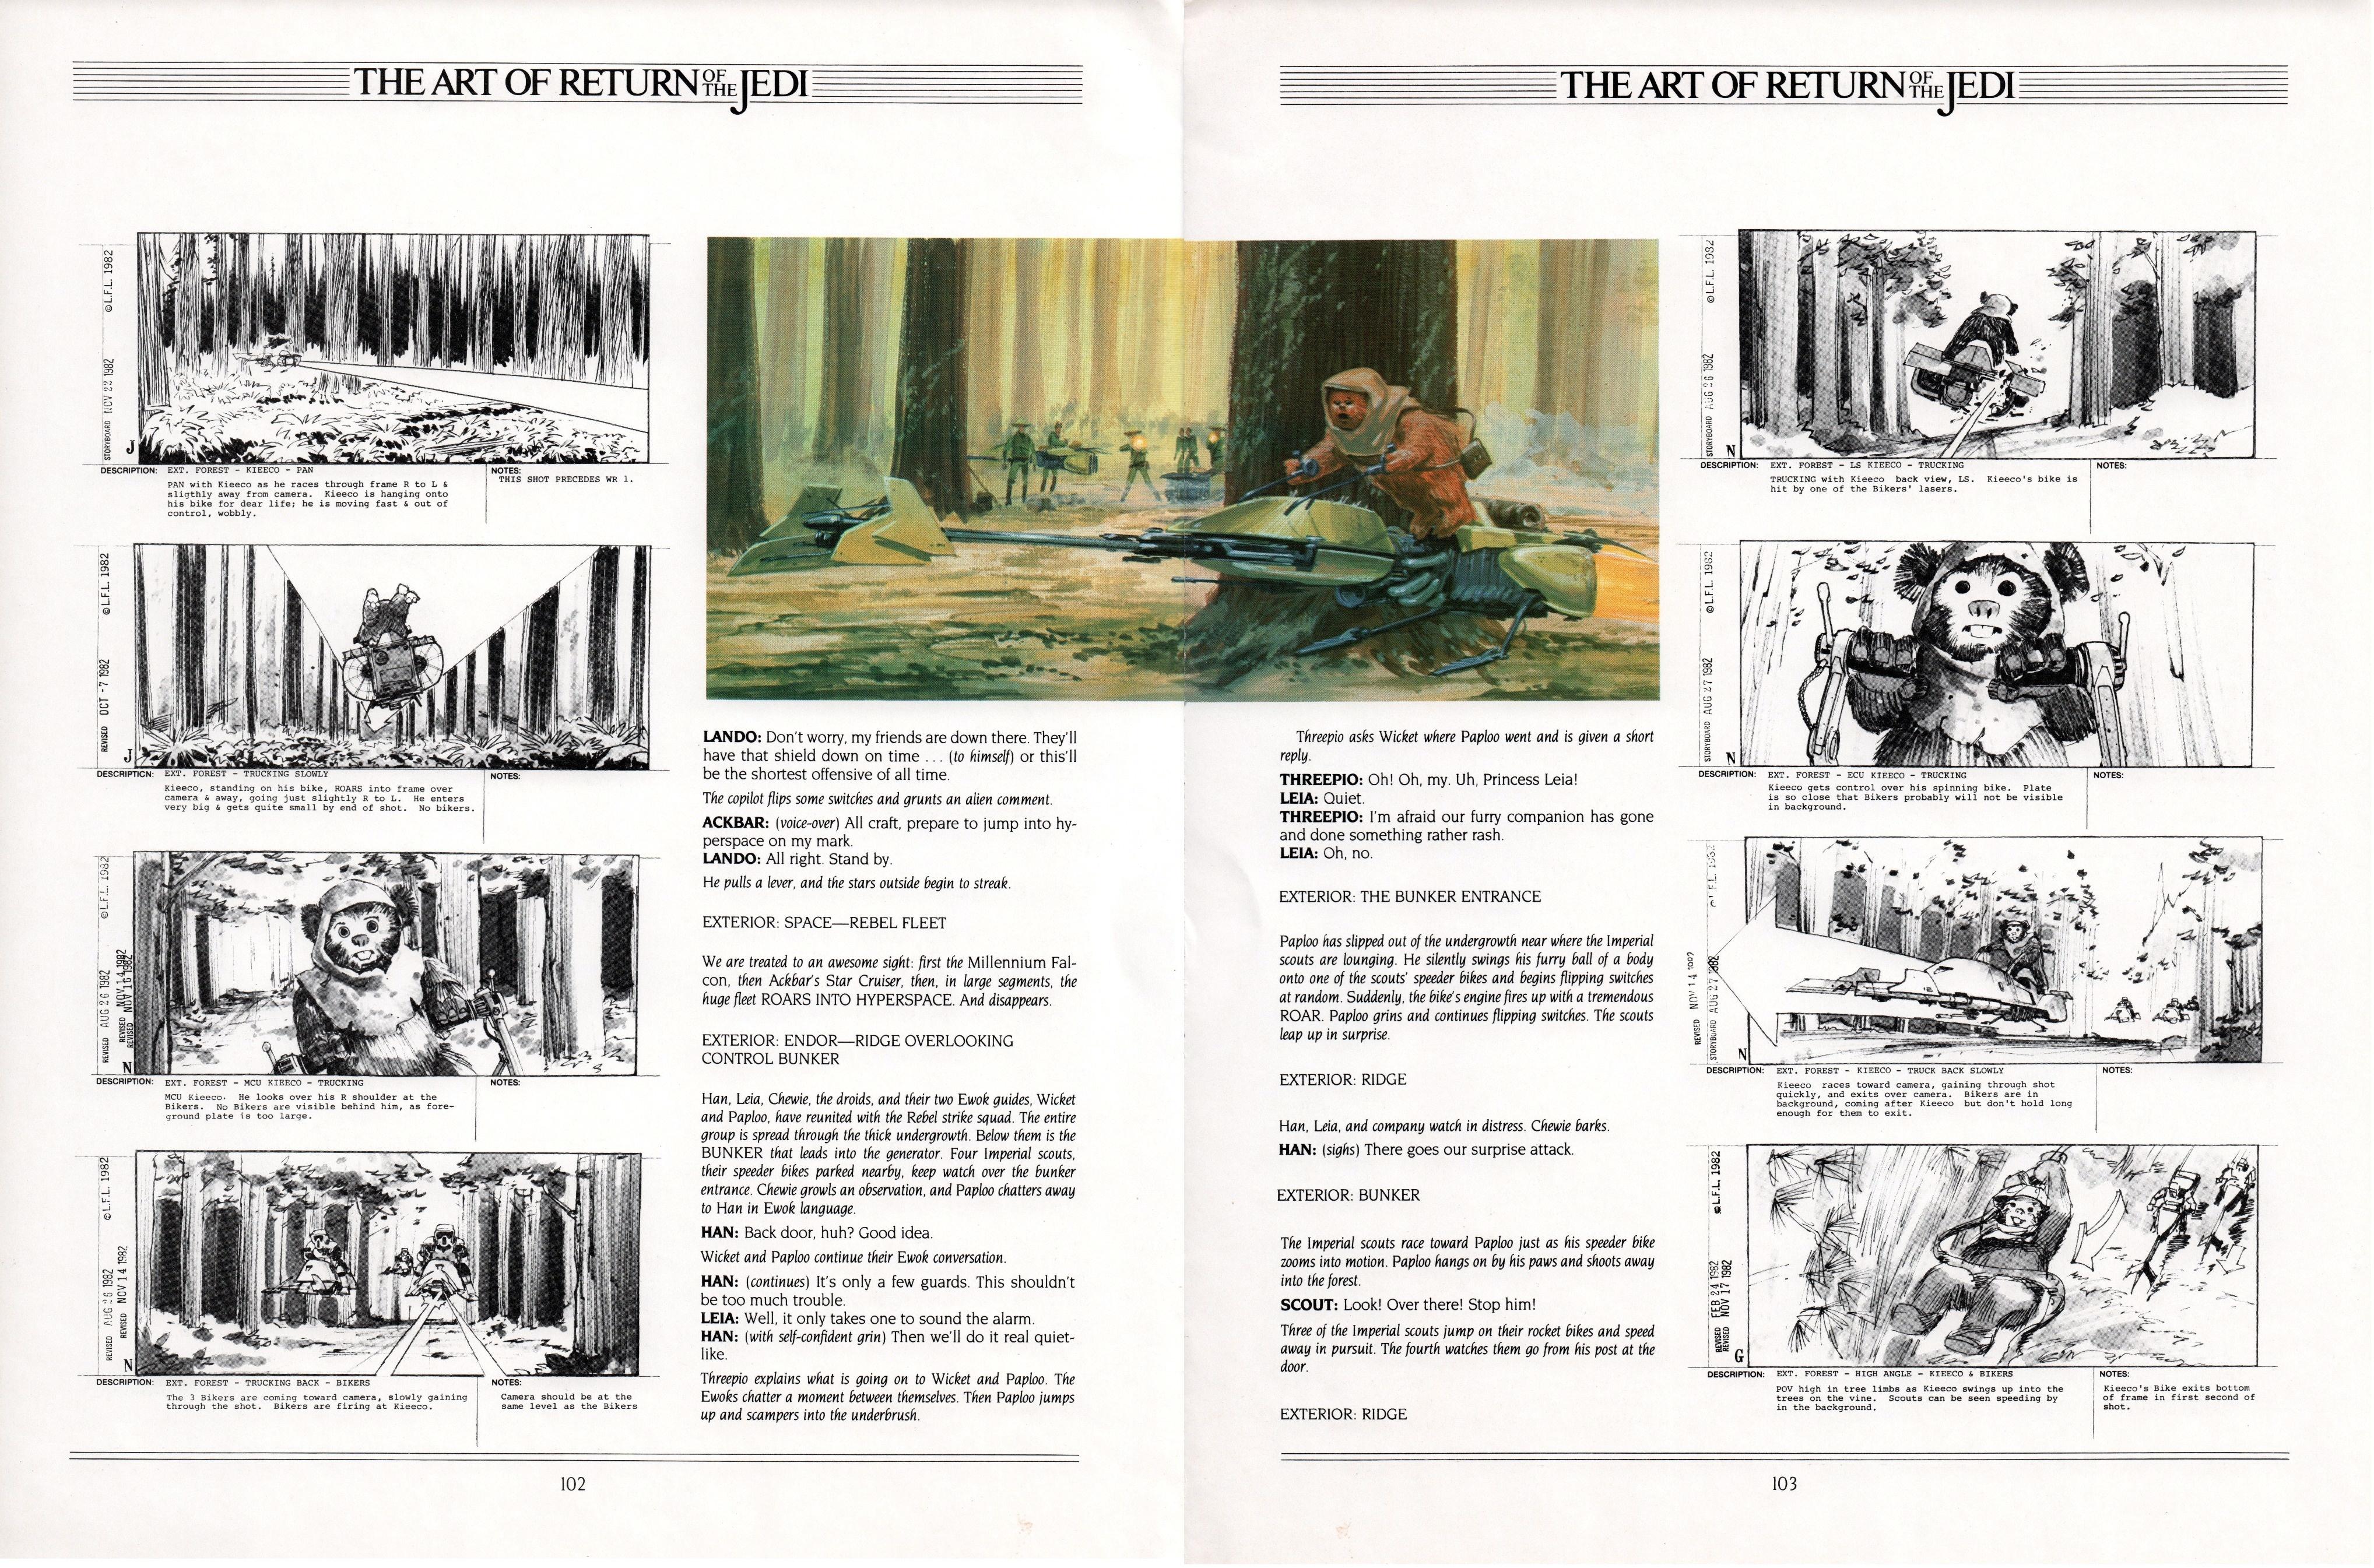 Art of Return of the Jedi (b0bafett_Empire)-p102-103